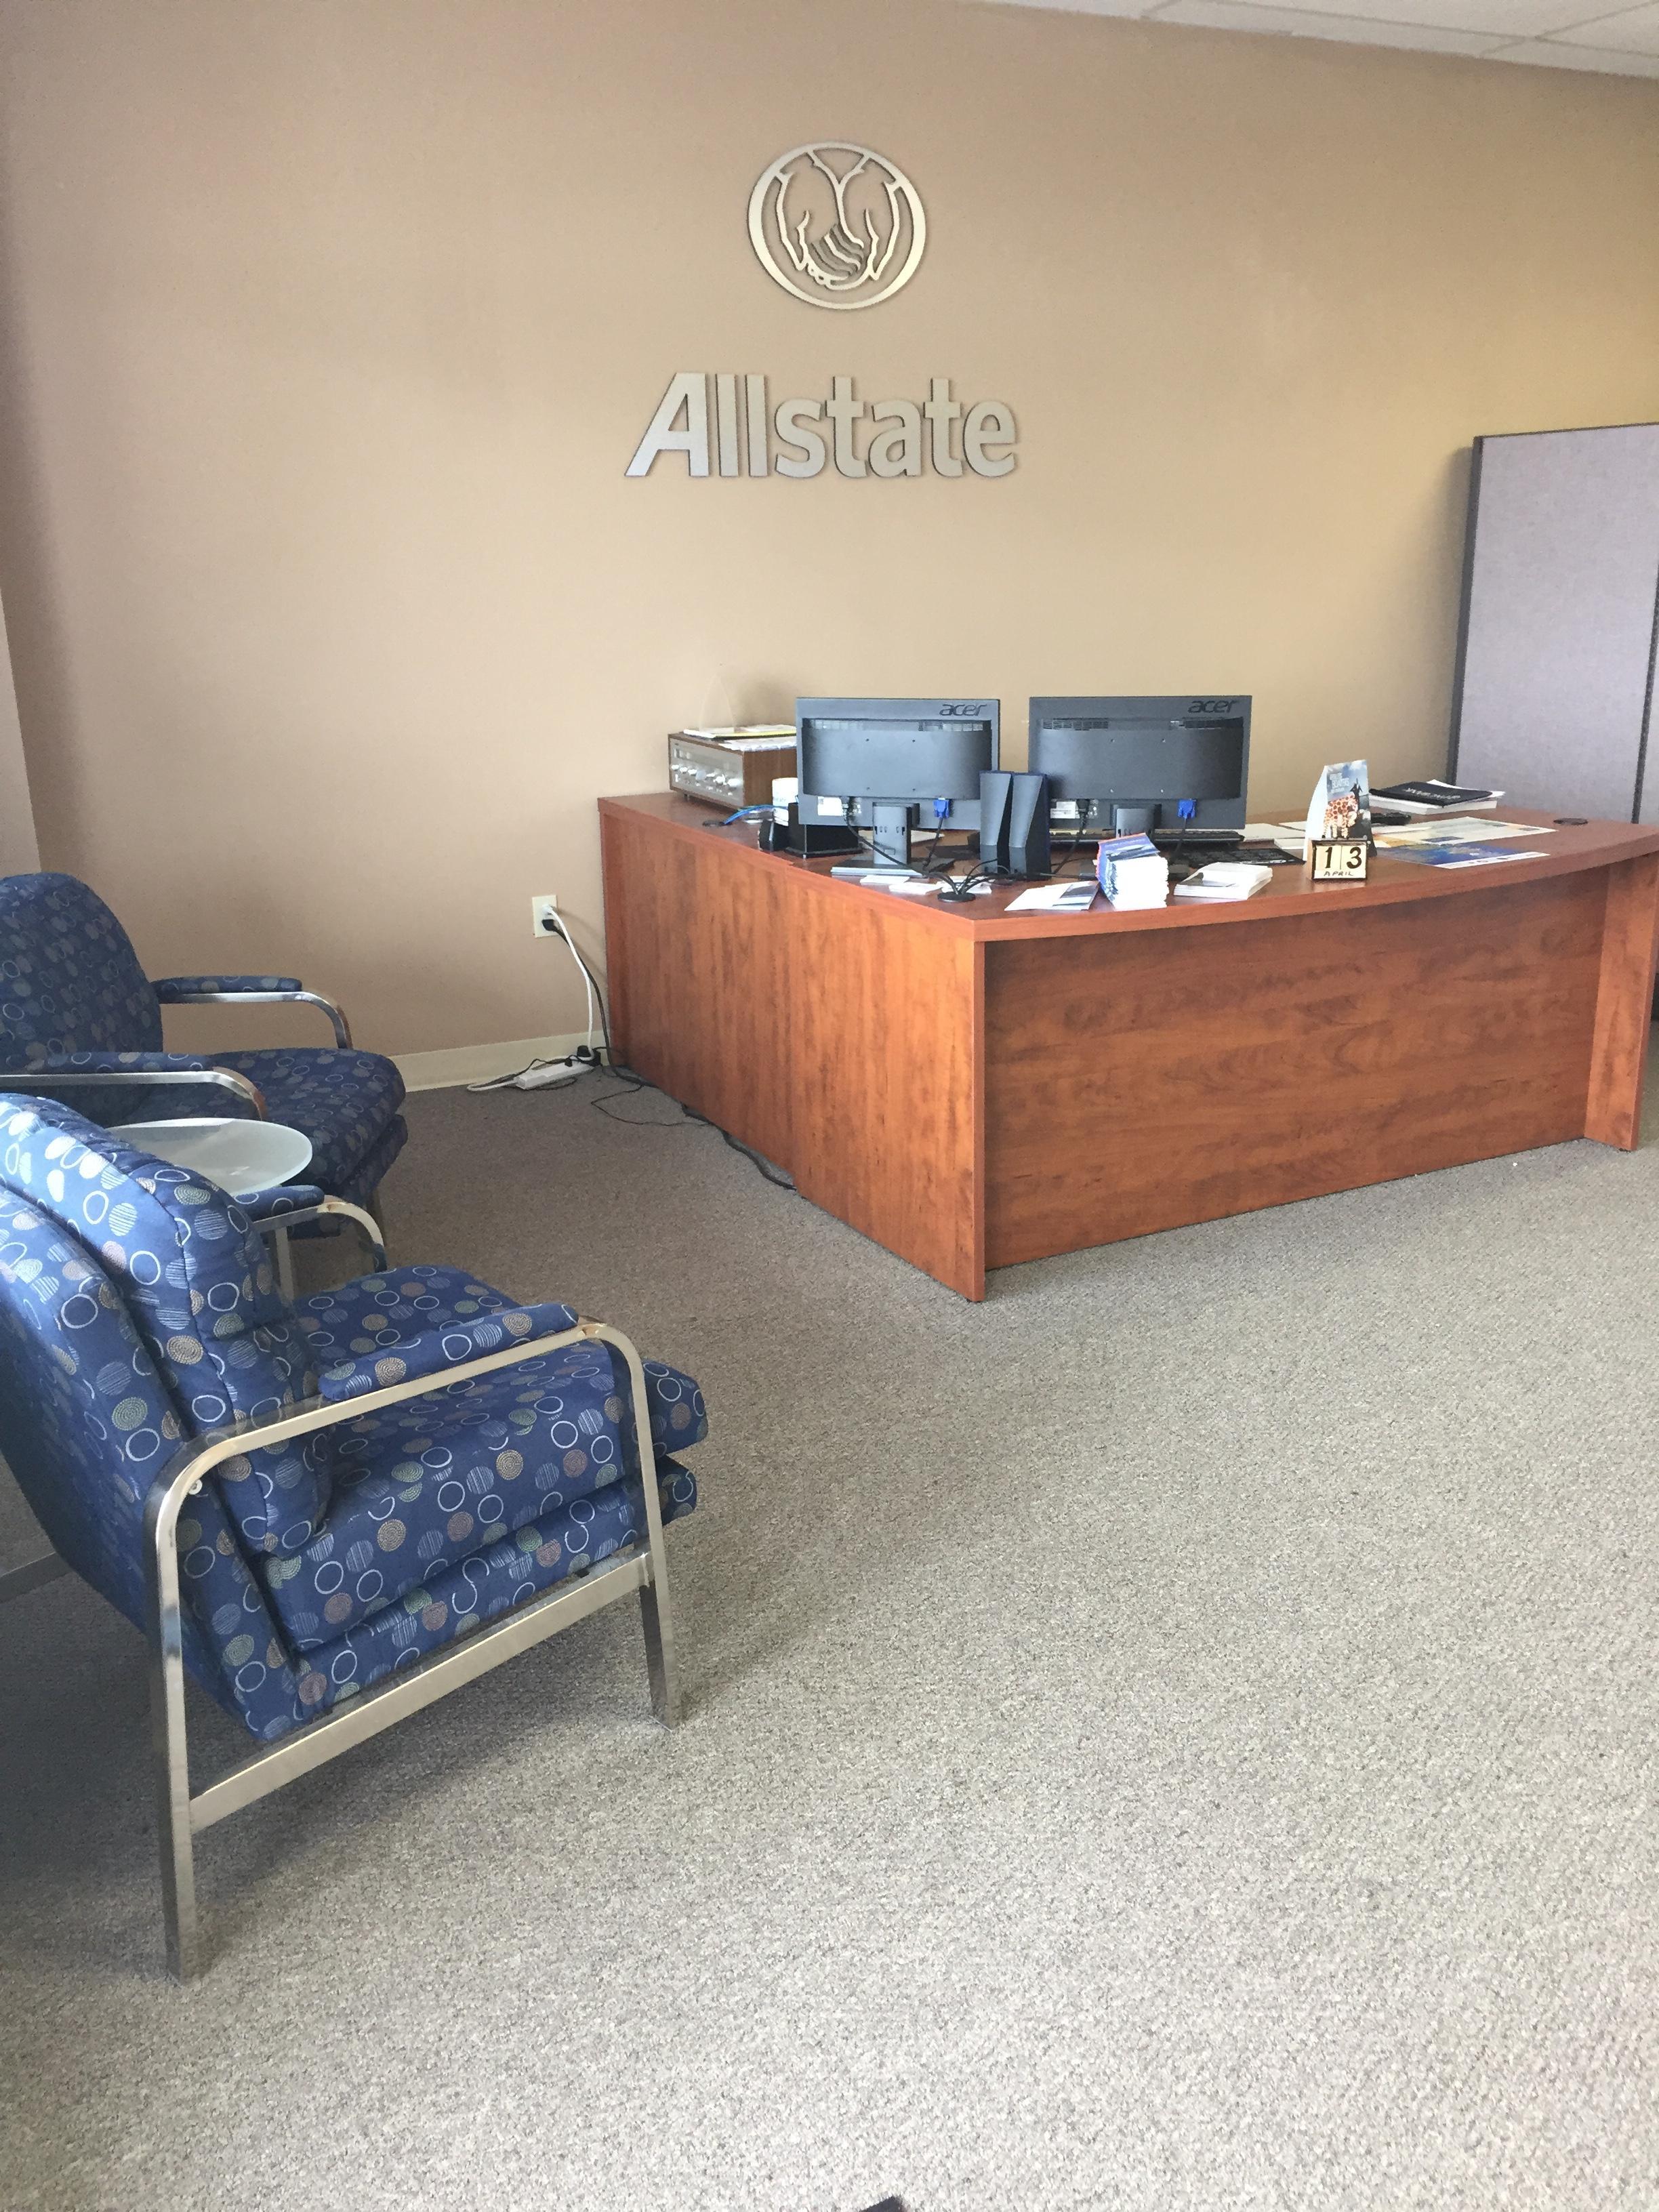 Allstate Insurance Agent: Michael Bess image 1